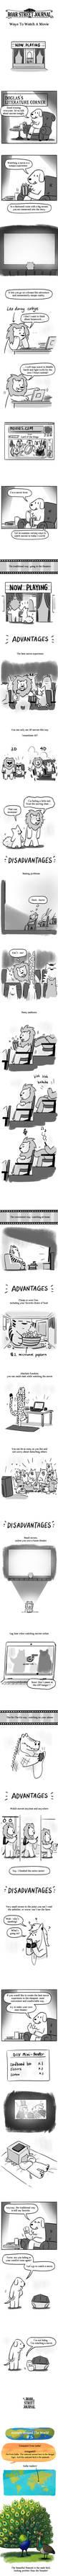 [RSJ webtoon] Ways To Watch A Movie